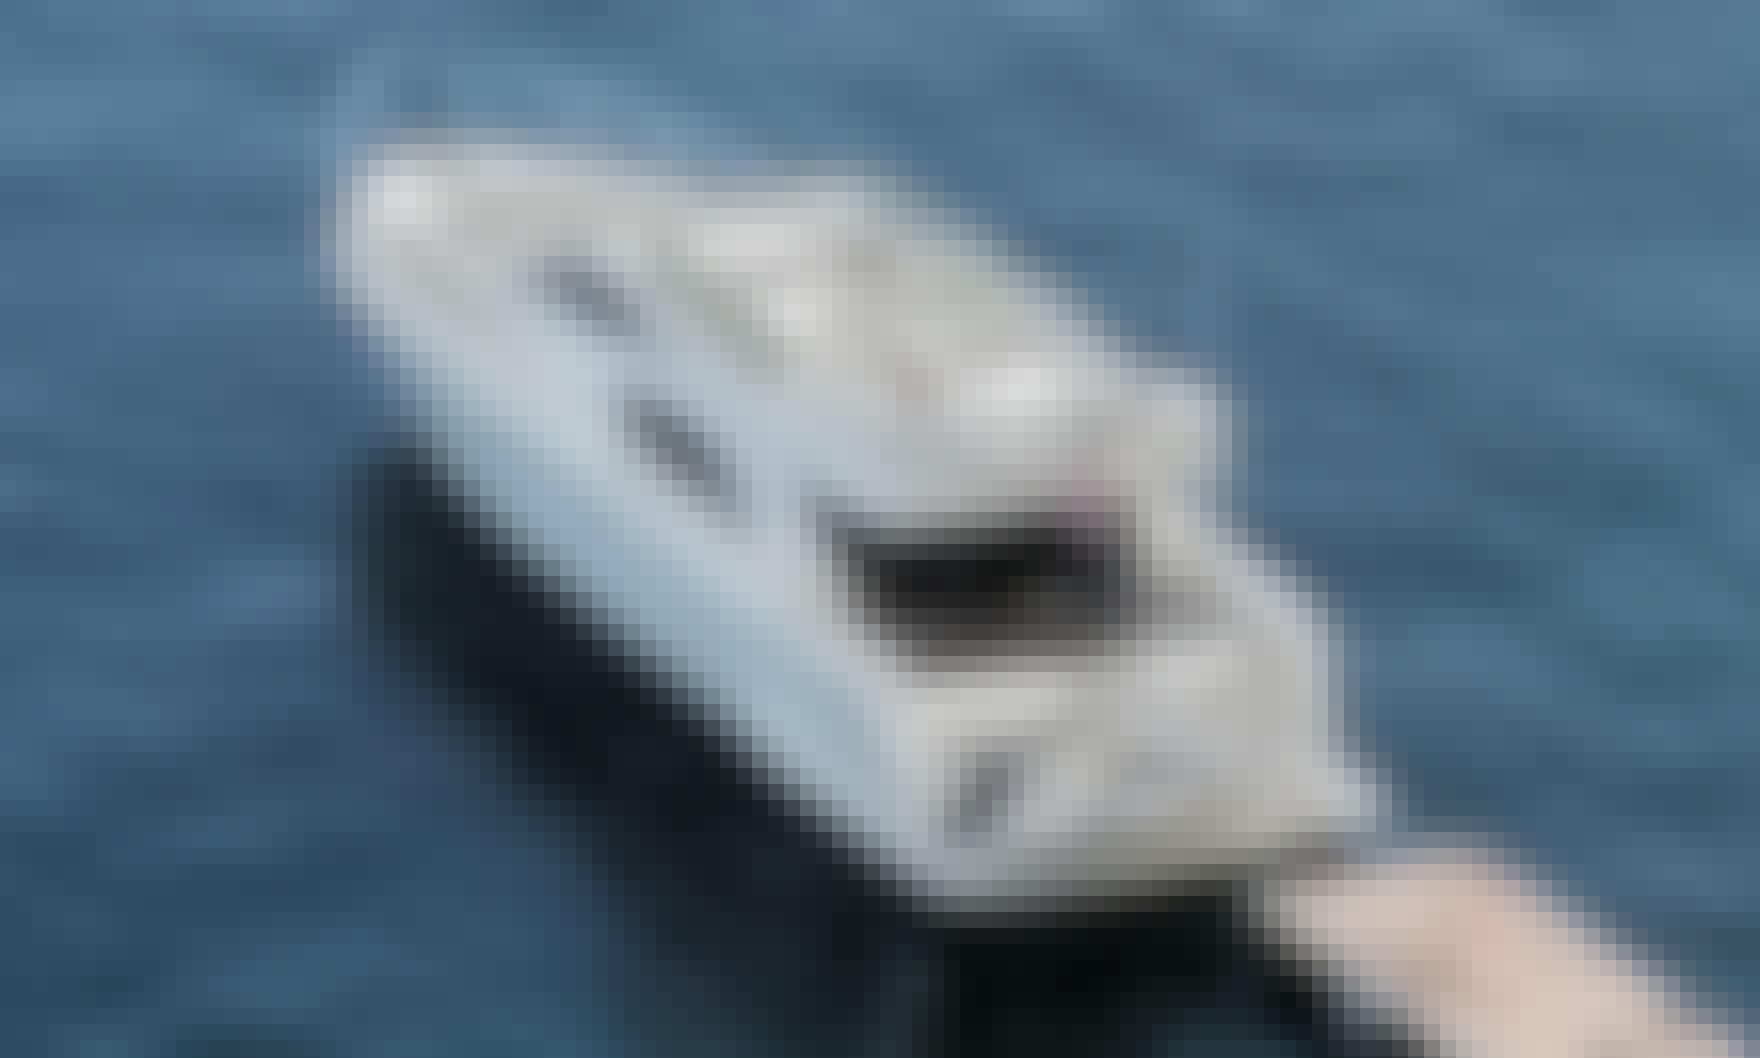 Motor Yacht Rental in Notios Tomeas Athinon